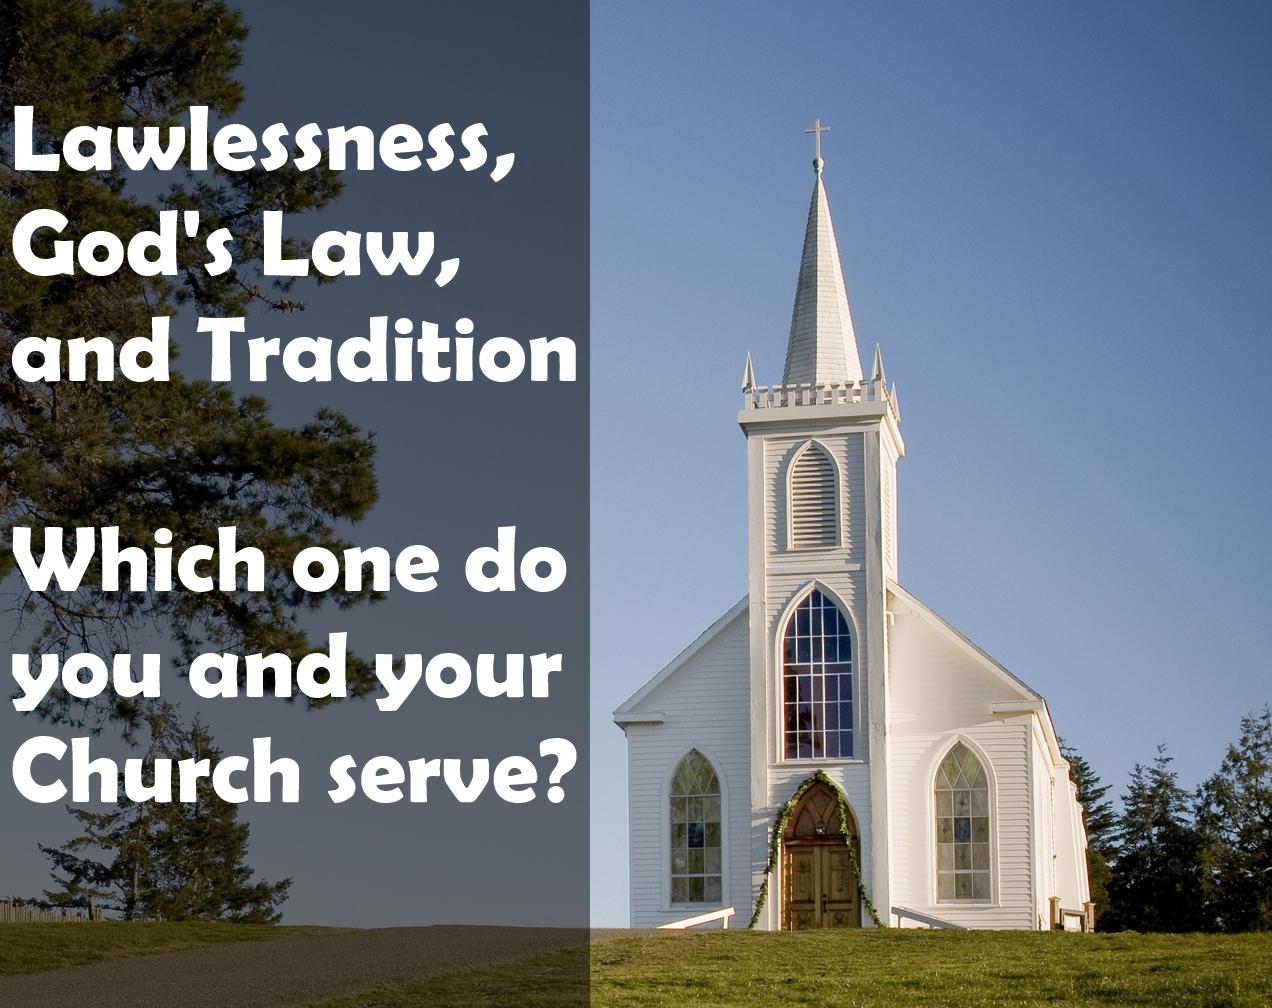 historic white church on the hill, bodega, california